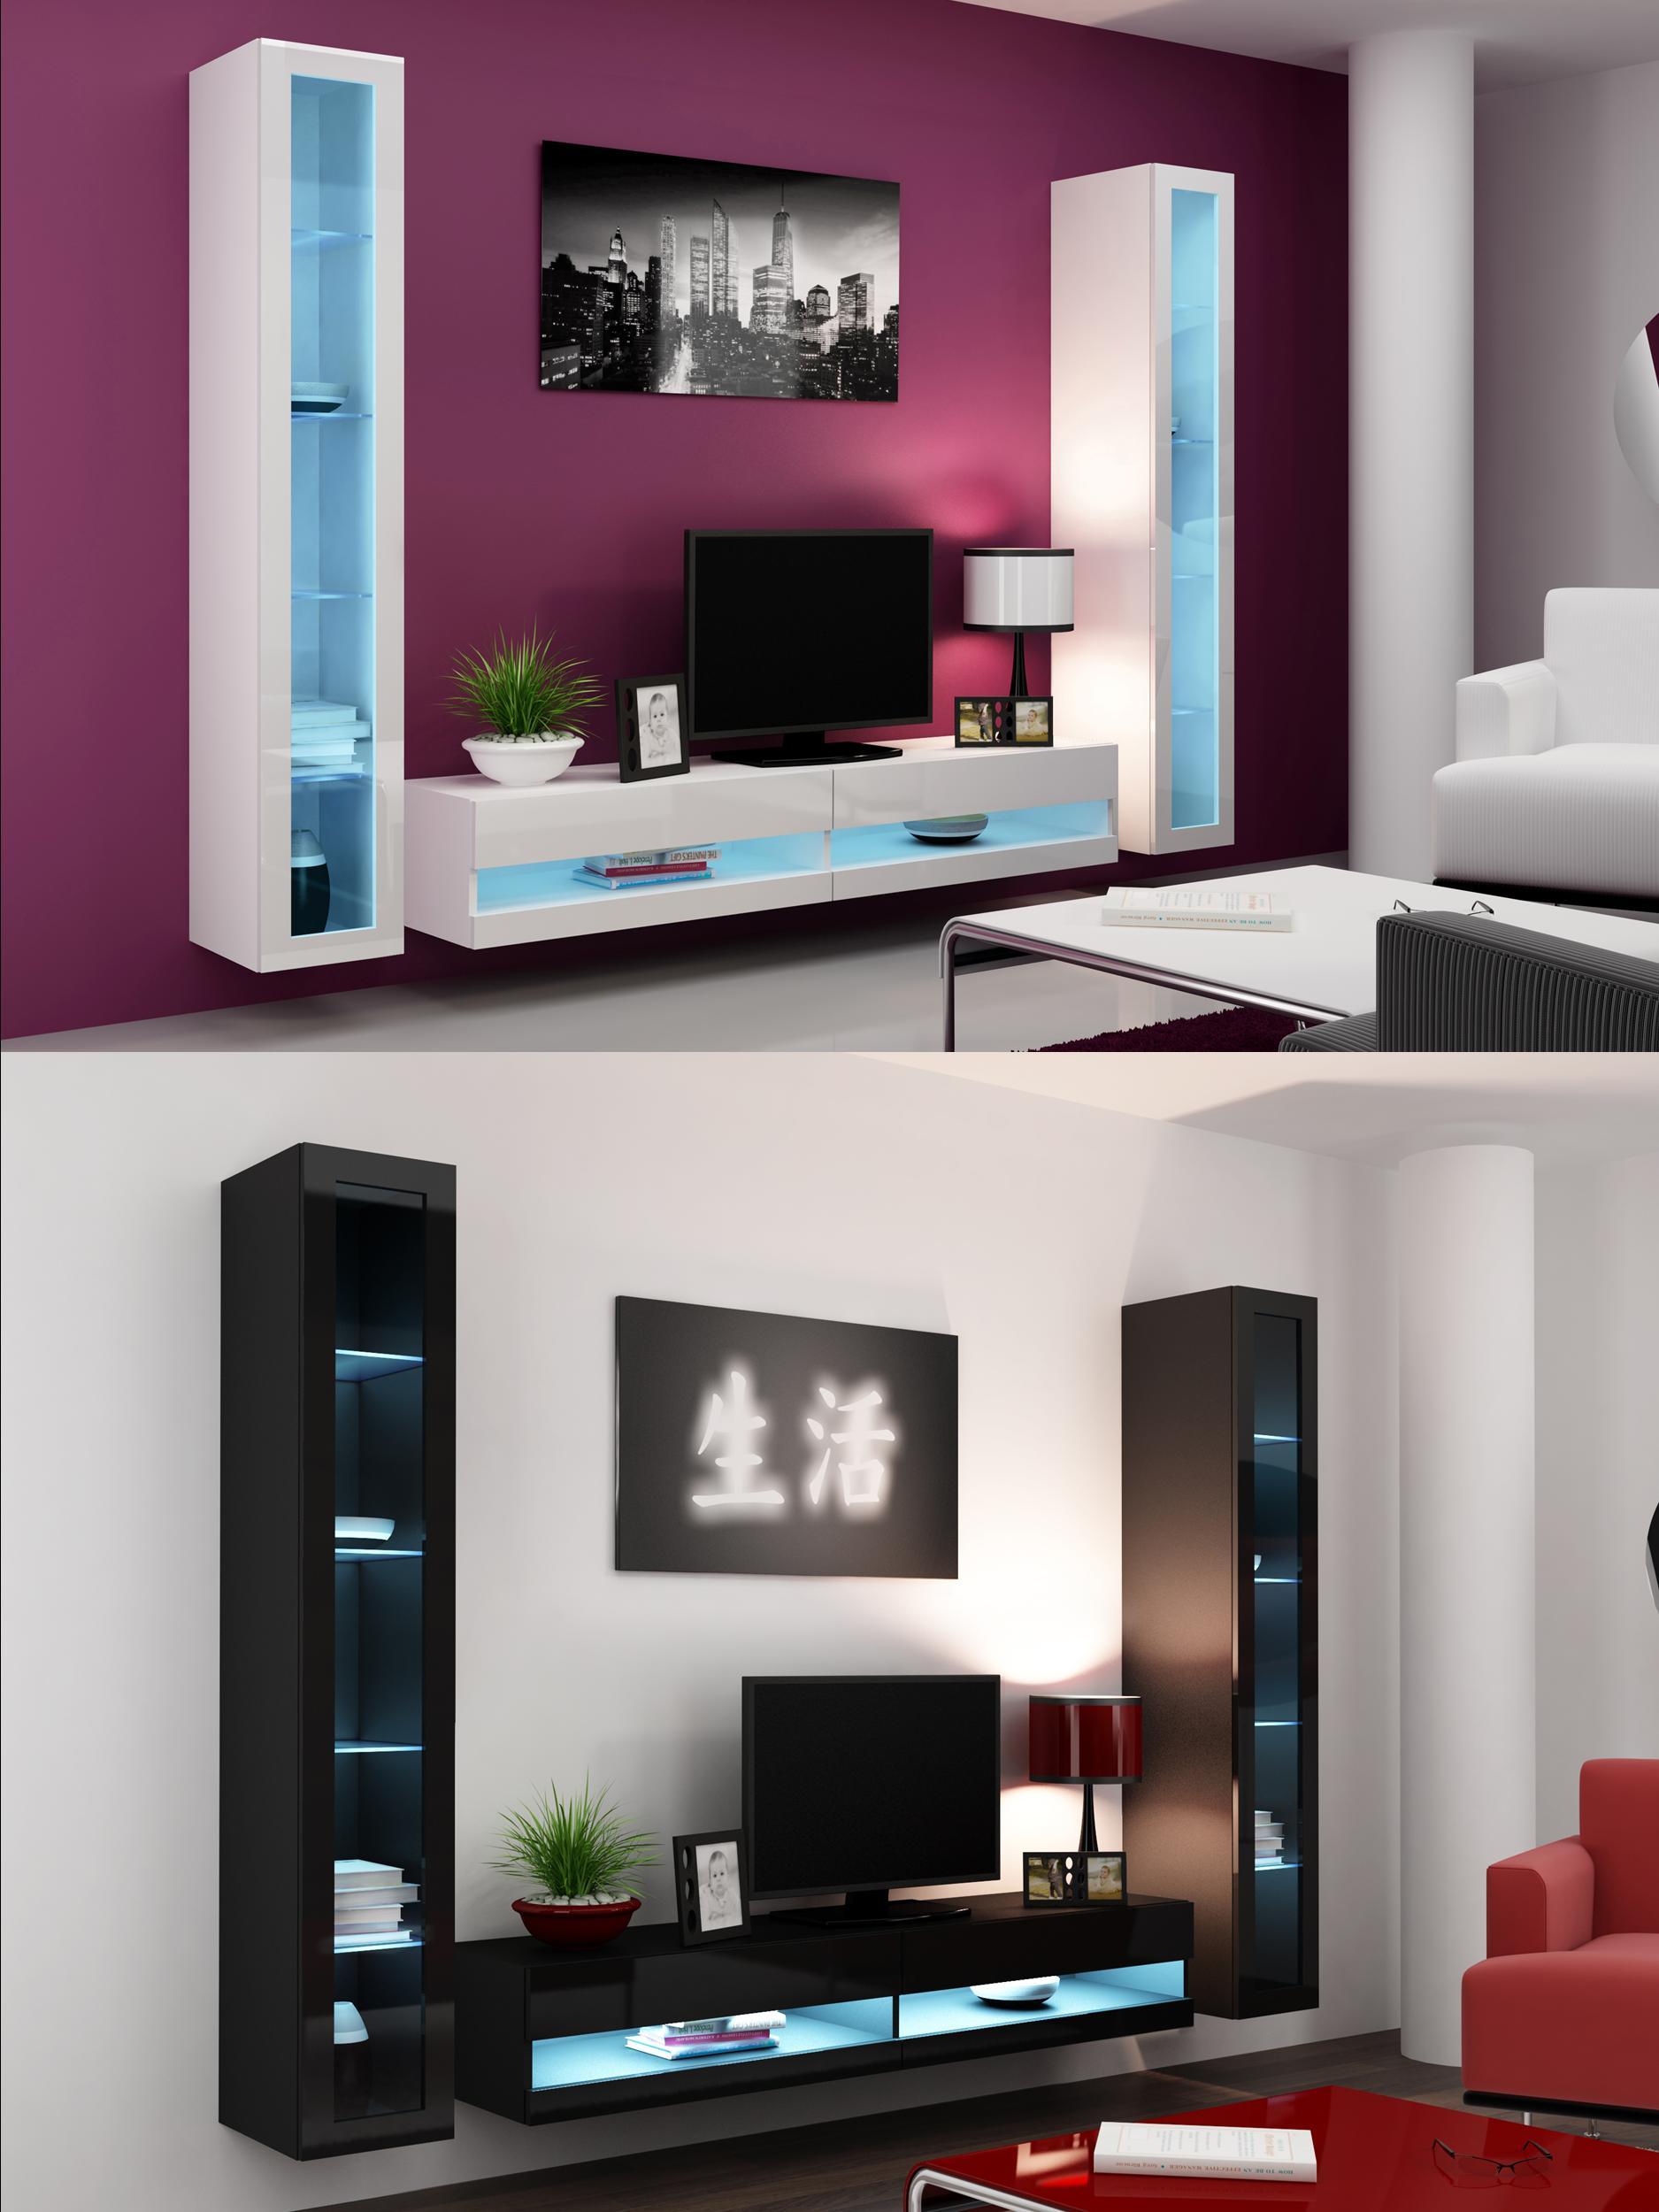 High Gloss Living Room Set with LED Lights TV Stand Wall Mounted